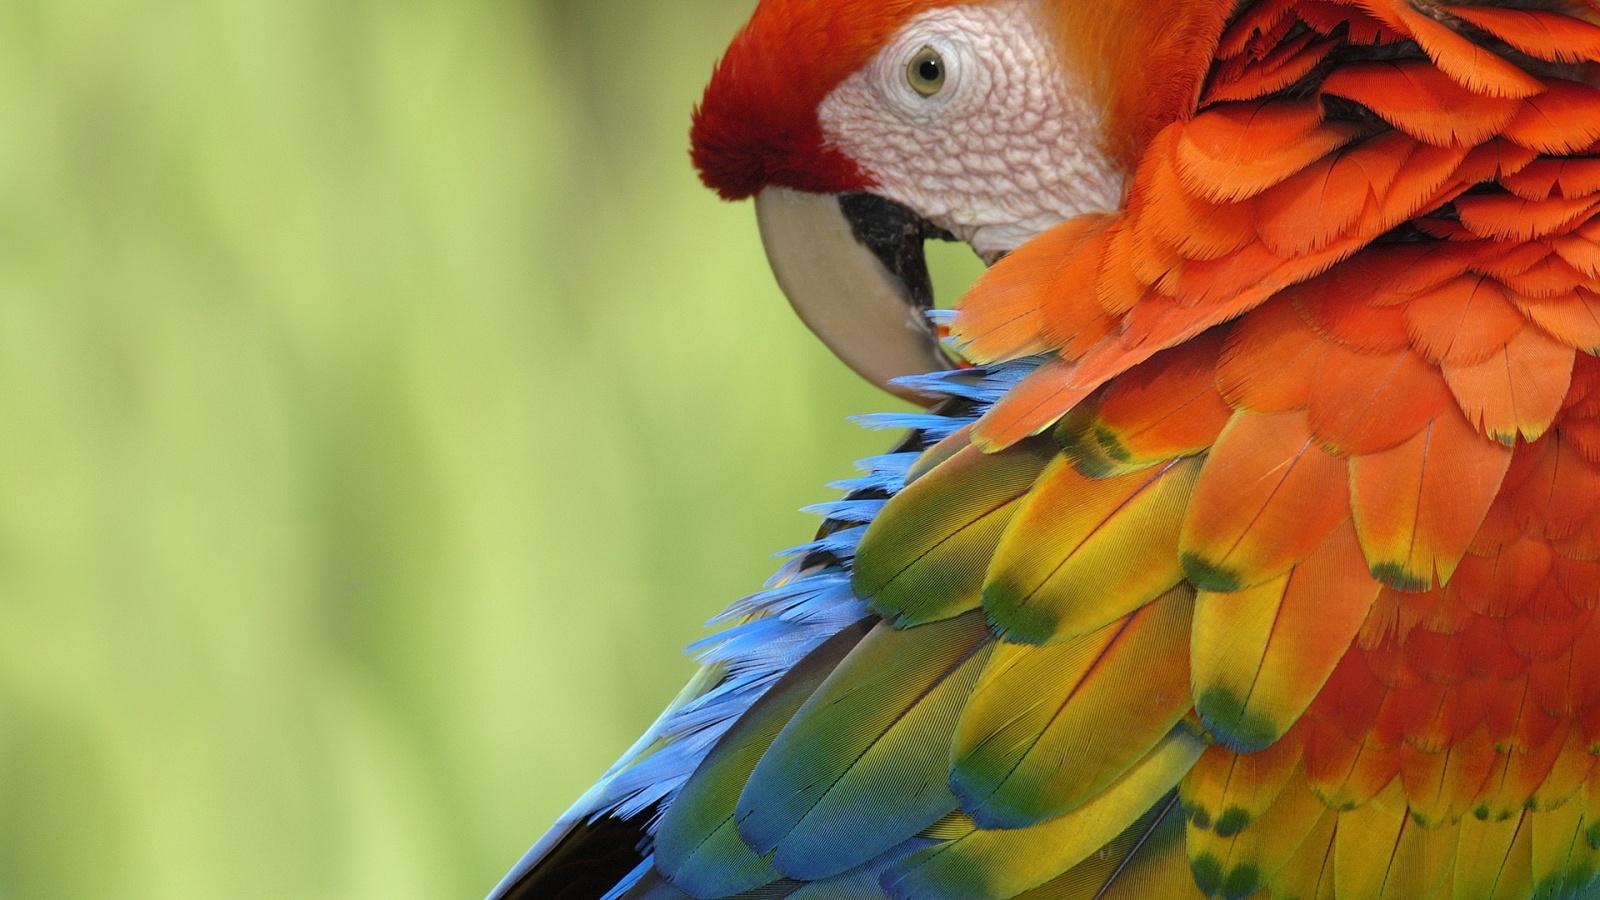 birds parrot wallpaper